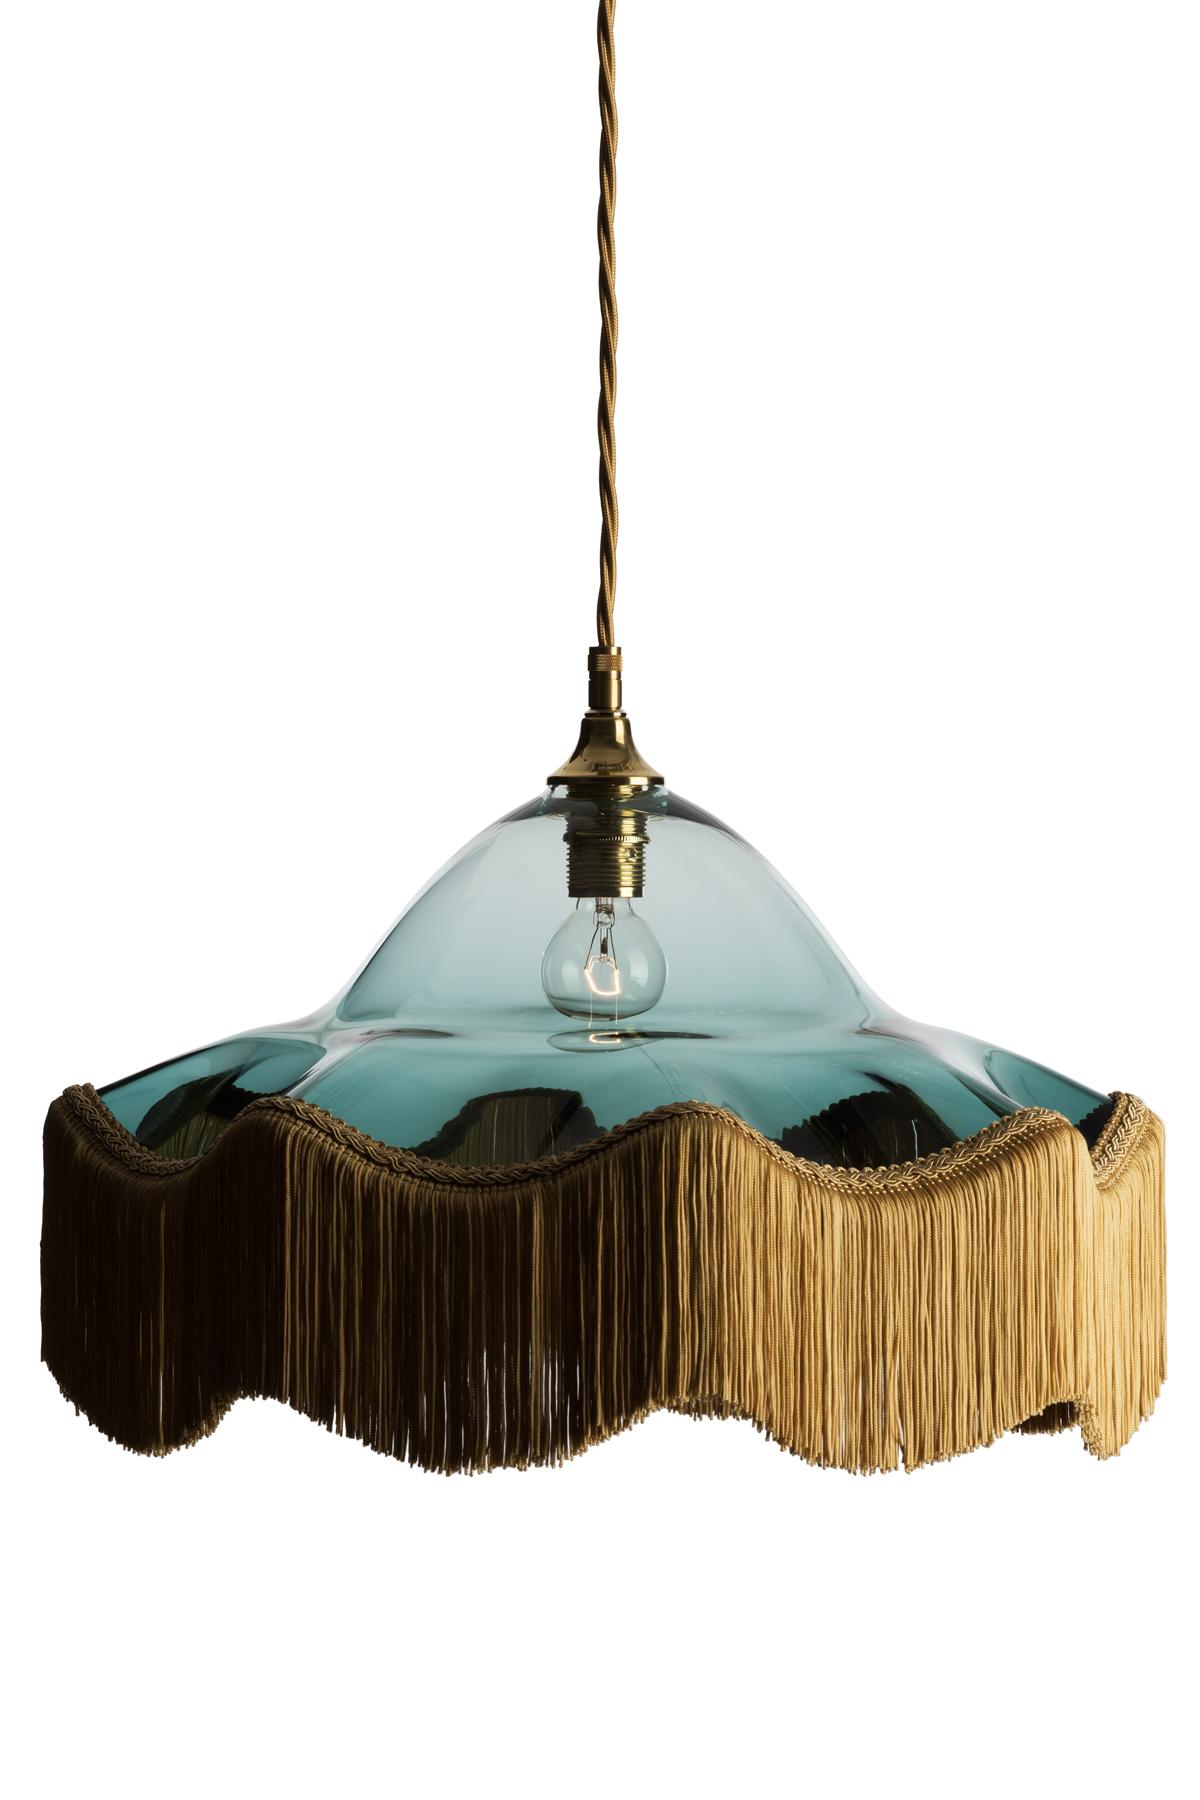 FRINGE BENEFITS: THE LATEST TASSELED LAMPS | Livingetc